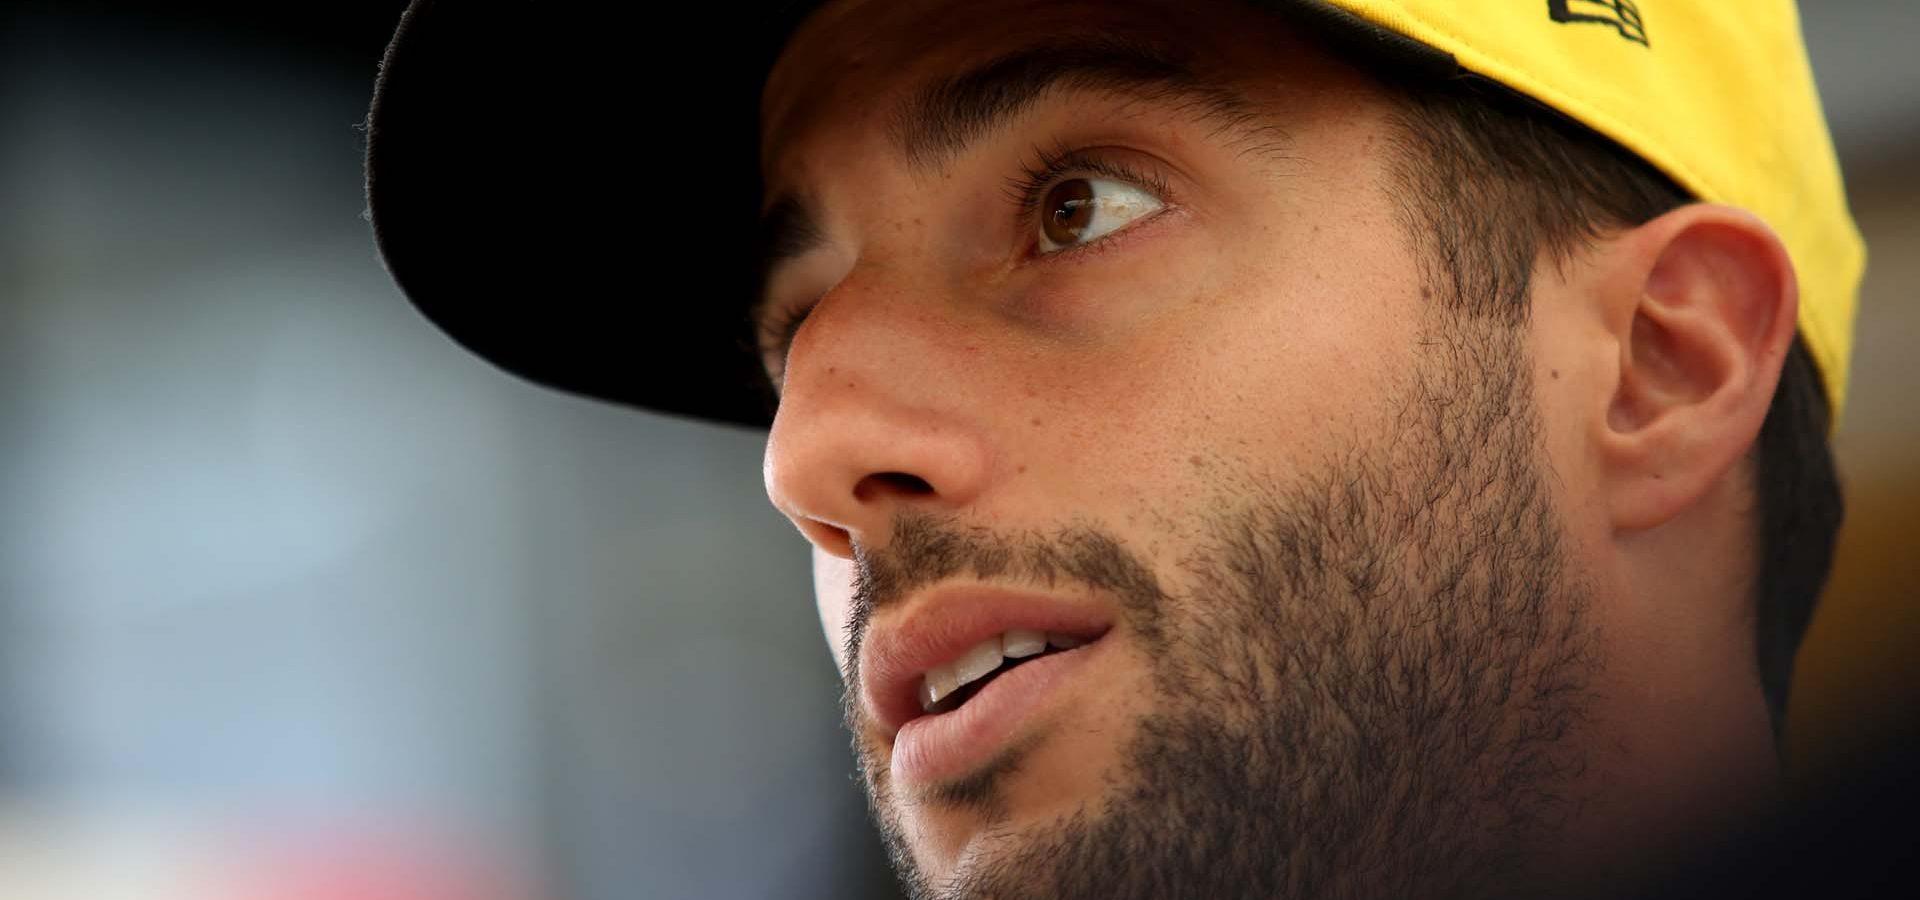 Daniel Ricciardo (AUS) Renault F1 Team. Italian Grand Prix, Thursday 5th September 2019. Monza Italy.